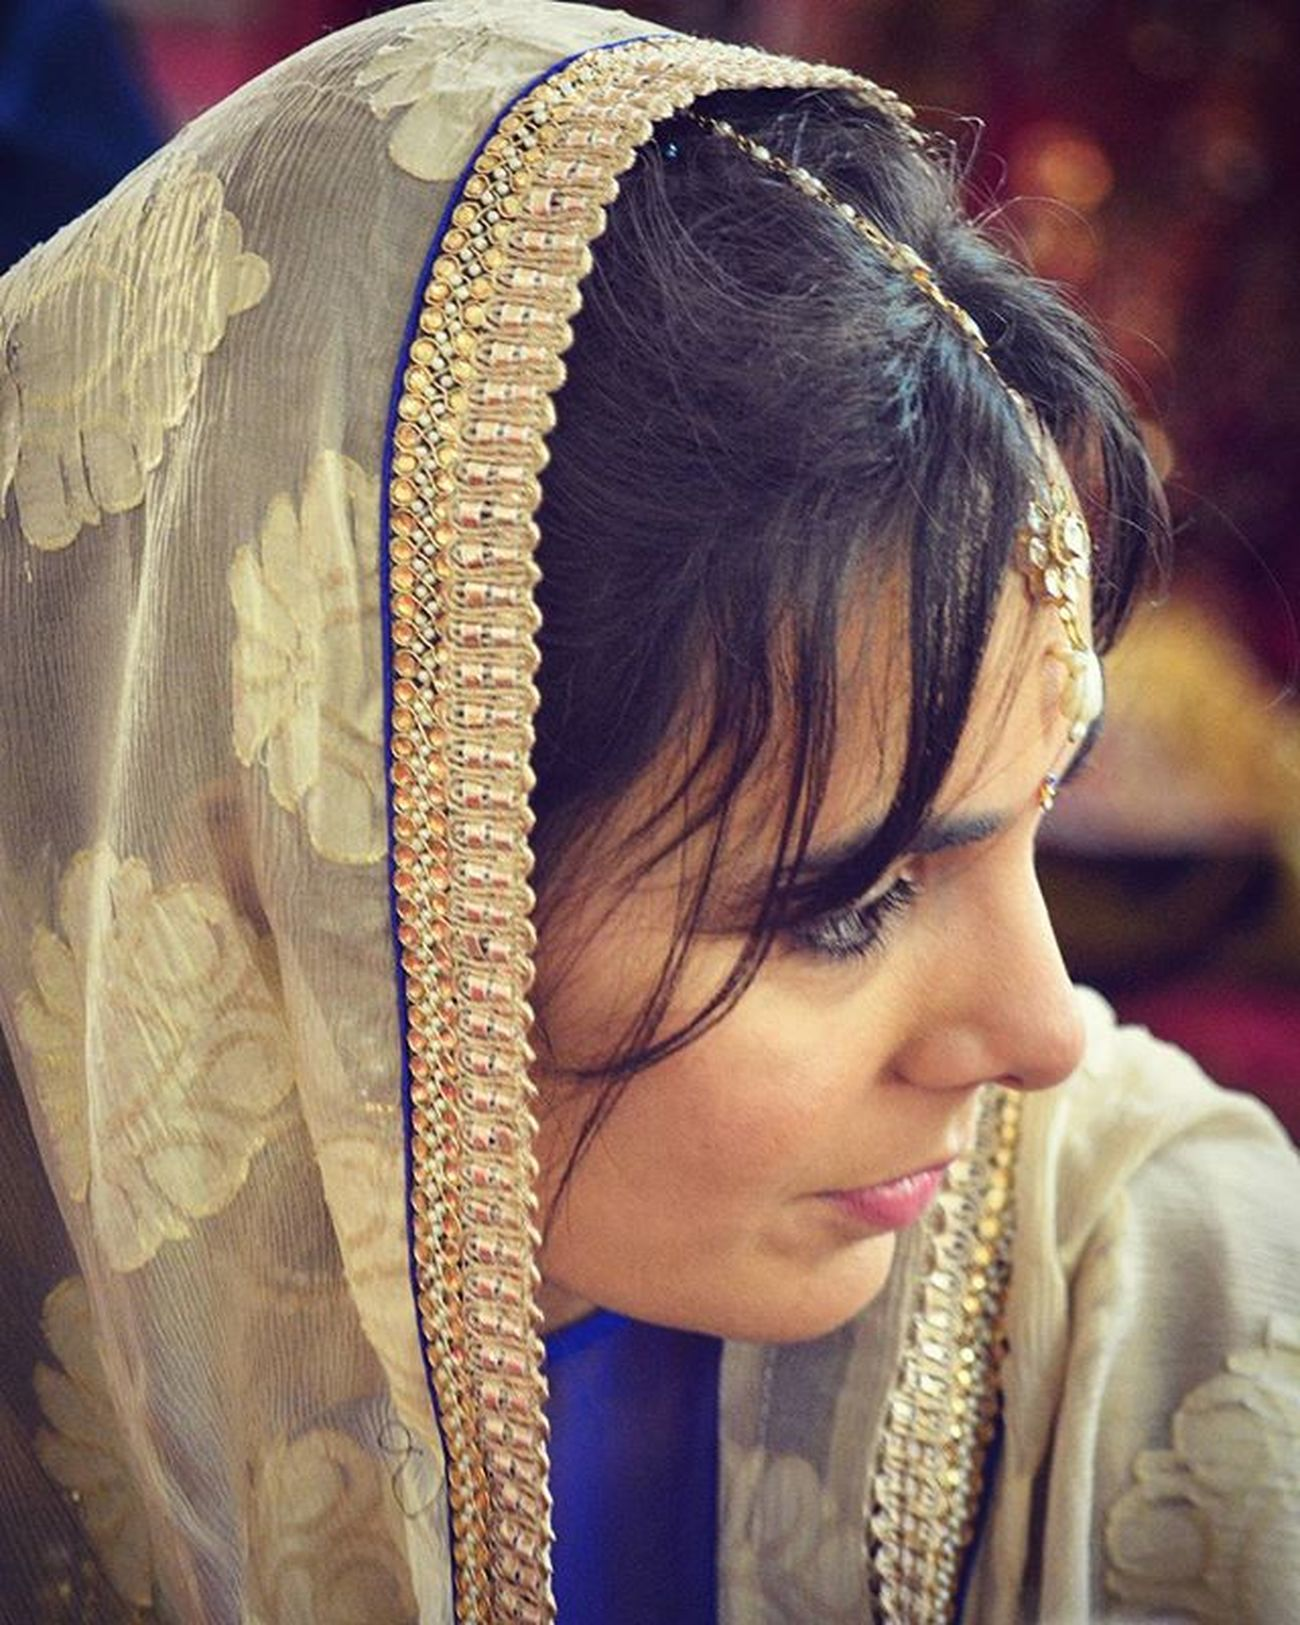 Aeshkydiwedding Candidshot Gagans_photography Picsart